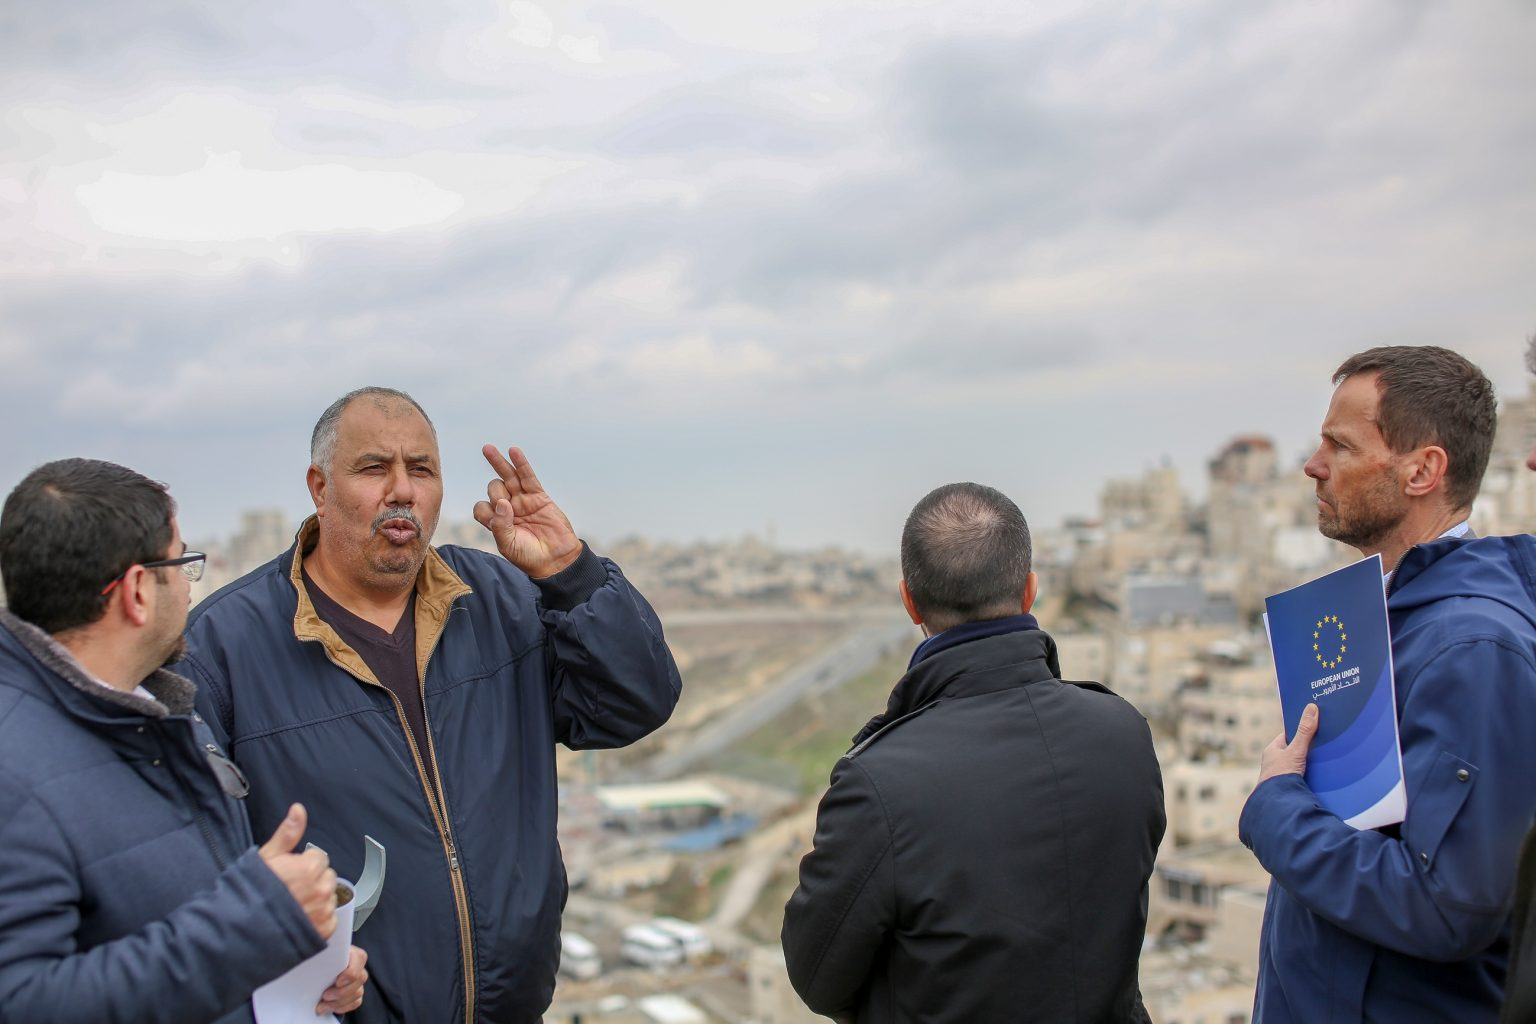 Delegazione UE visita Gerusalemme e Ramallah